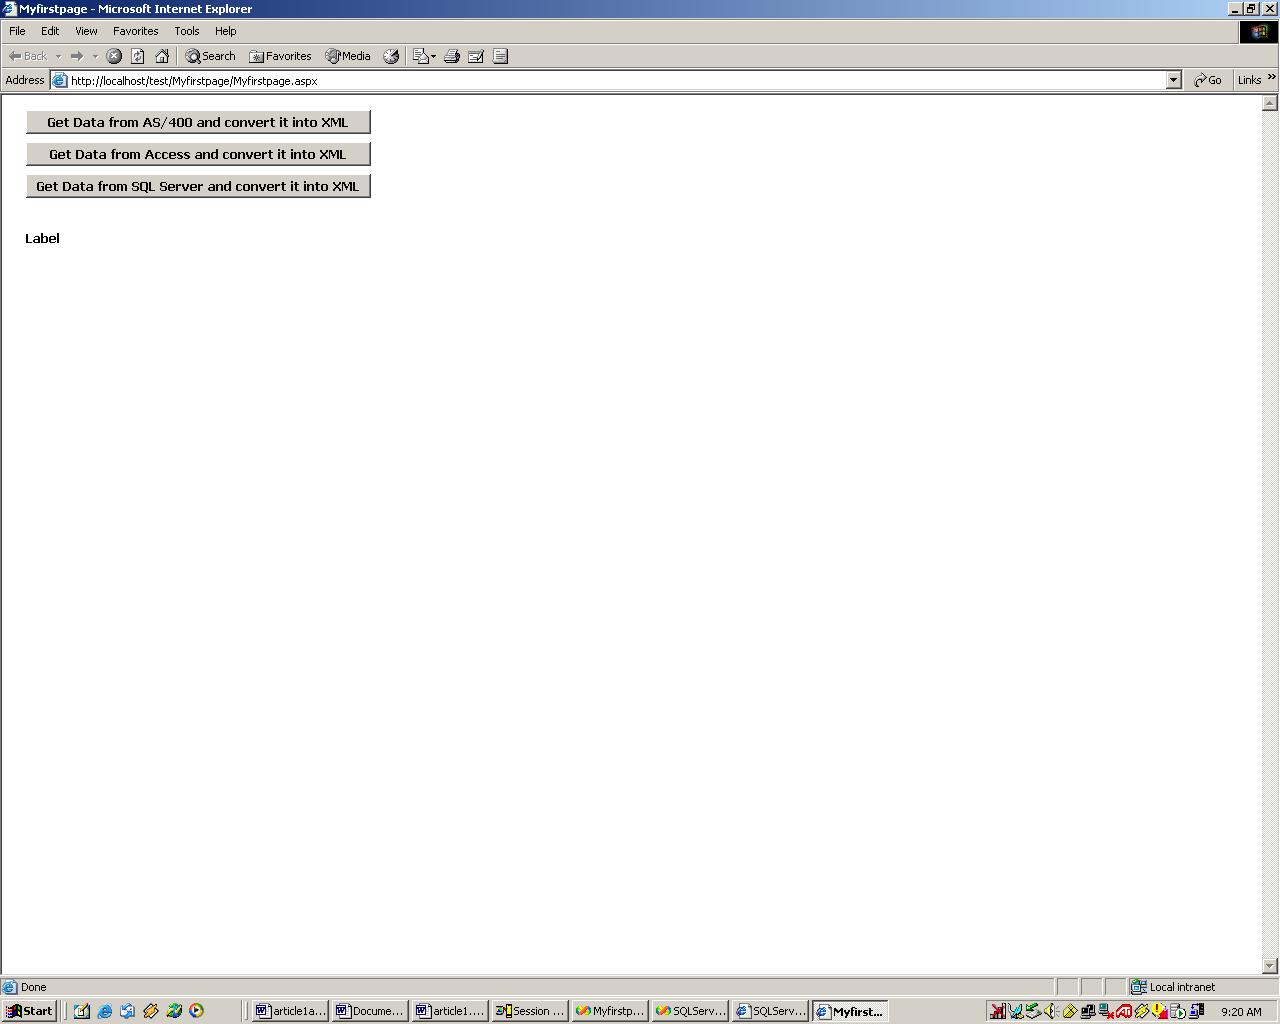 http://www.mcpressonline.com/articles/images/2002/article_final--Malik062104--ConvertToXML%20V406.png